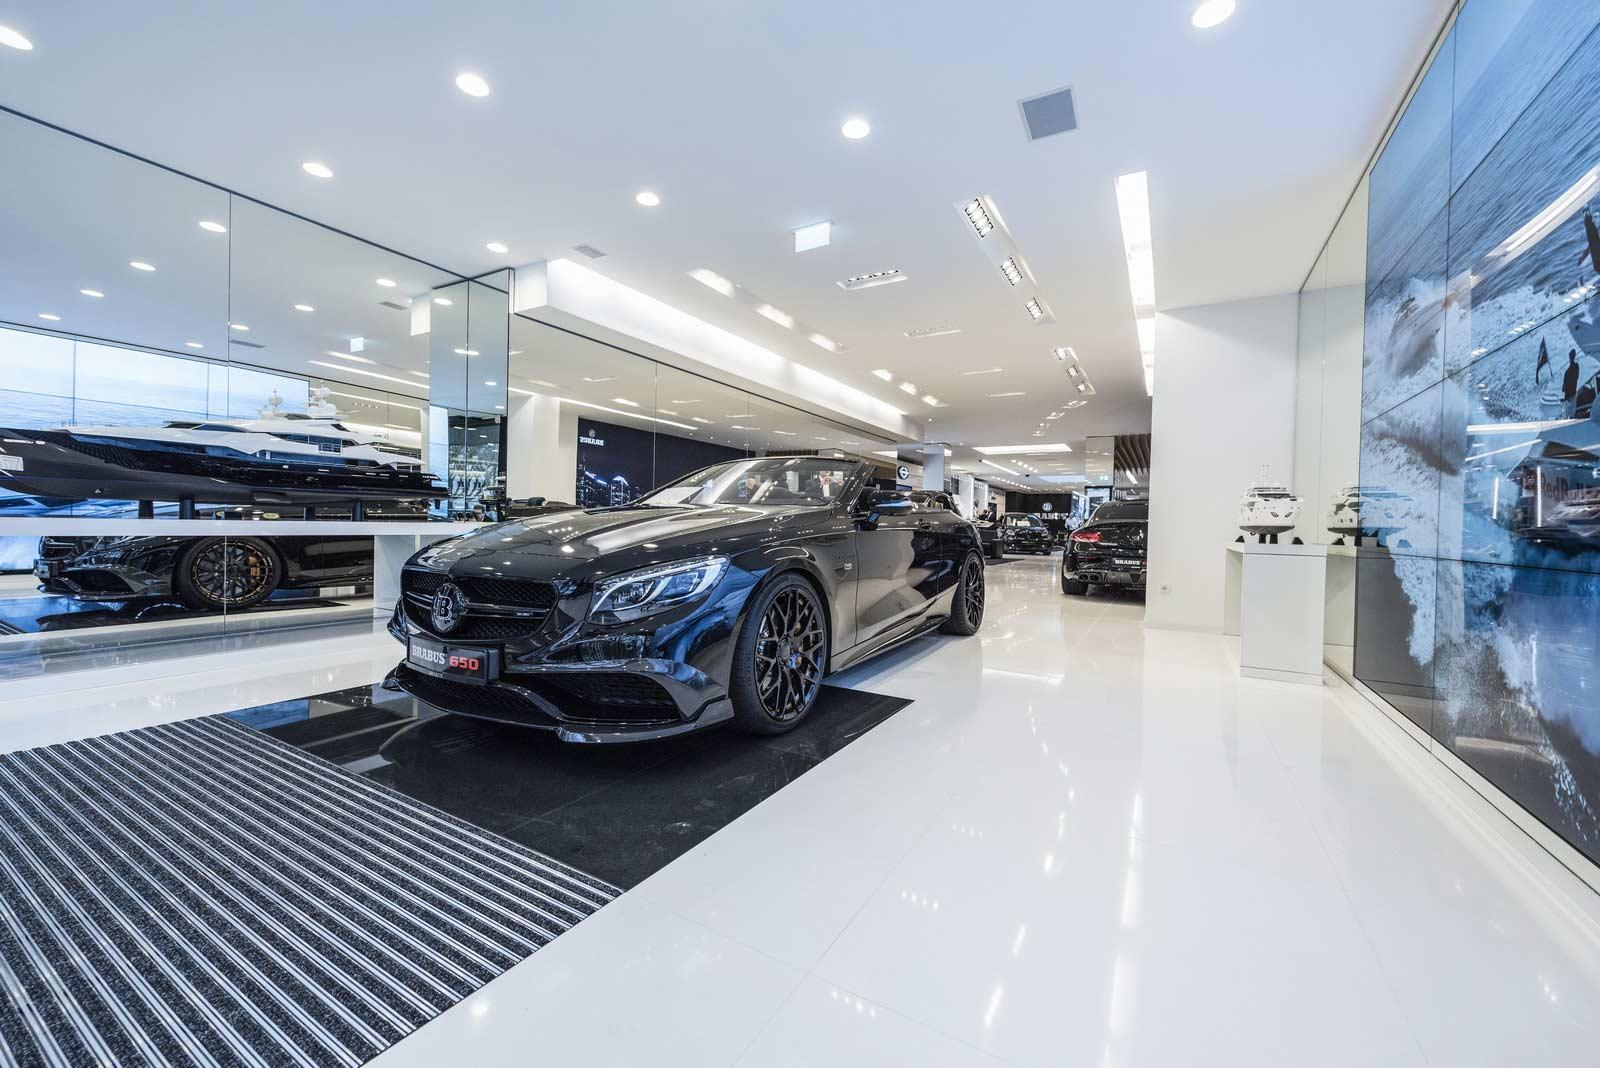 Brabus-Sunseeker-flagship-store-Dusseldorf_12